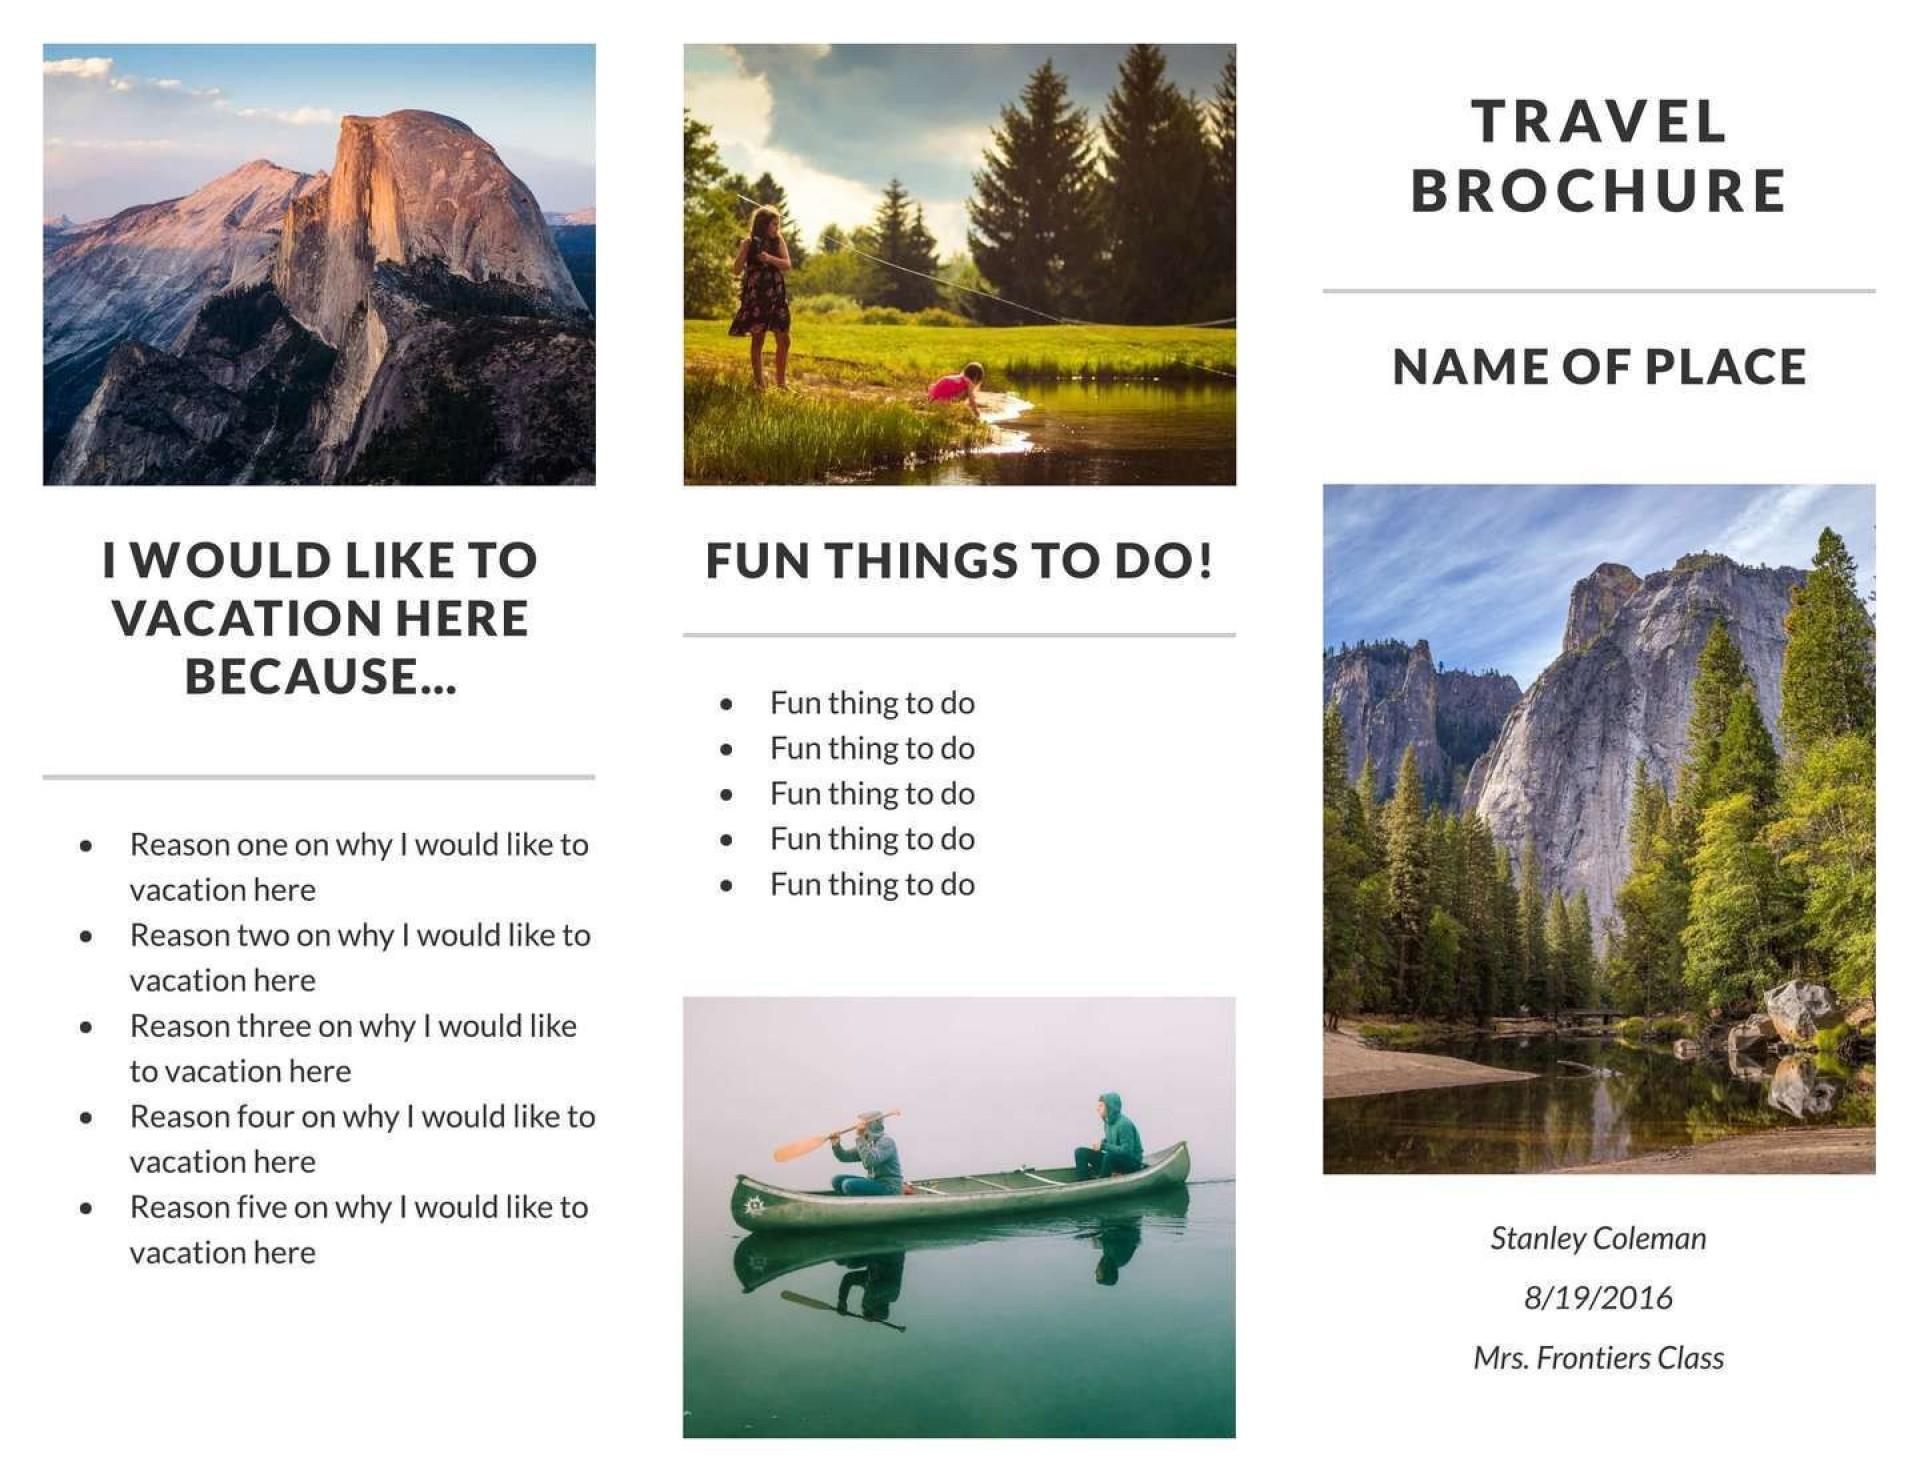 006 Singular M Word Travel Brochure Template Highest Quality  Microsoft Free1920